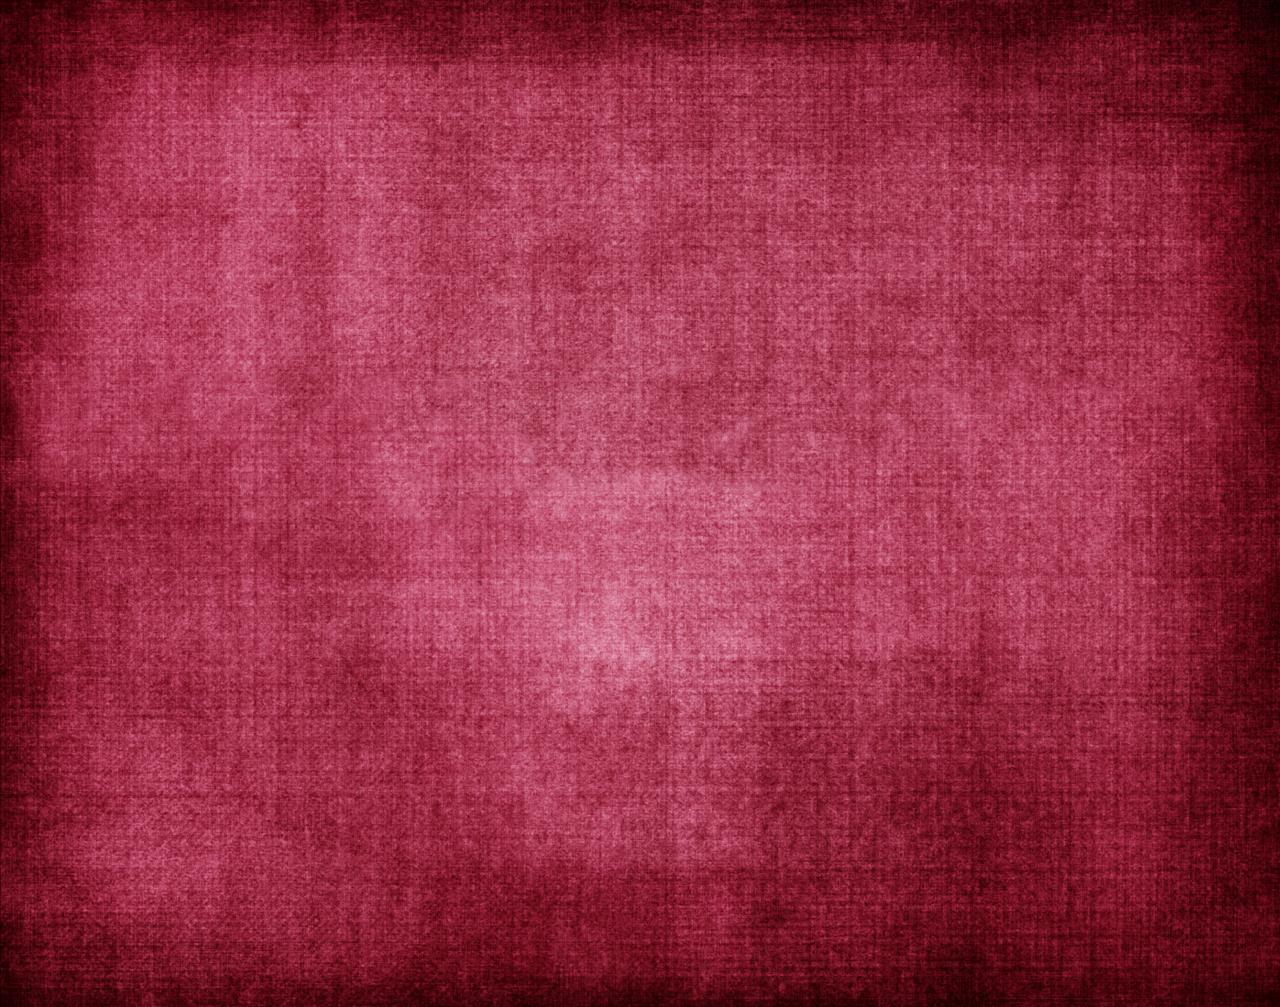 49 burgundy background wallpaper on wallpapersafari 49 burgundy background wallpaper on